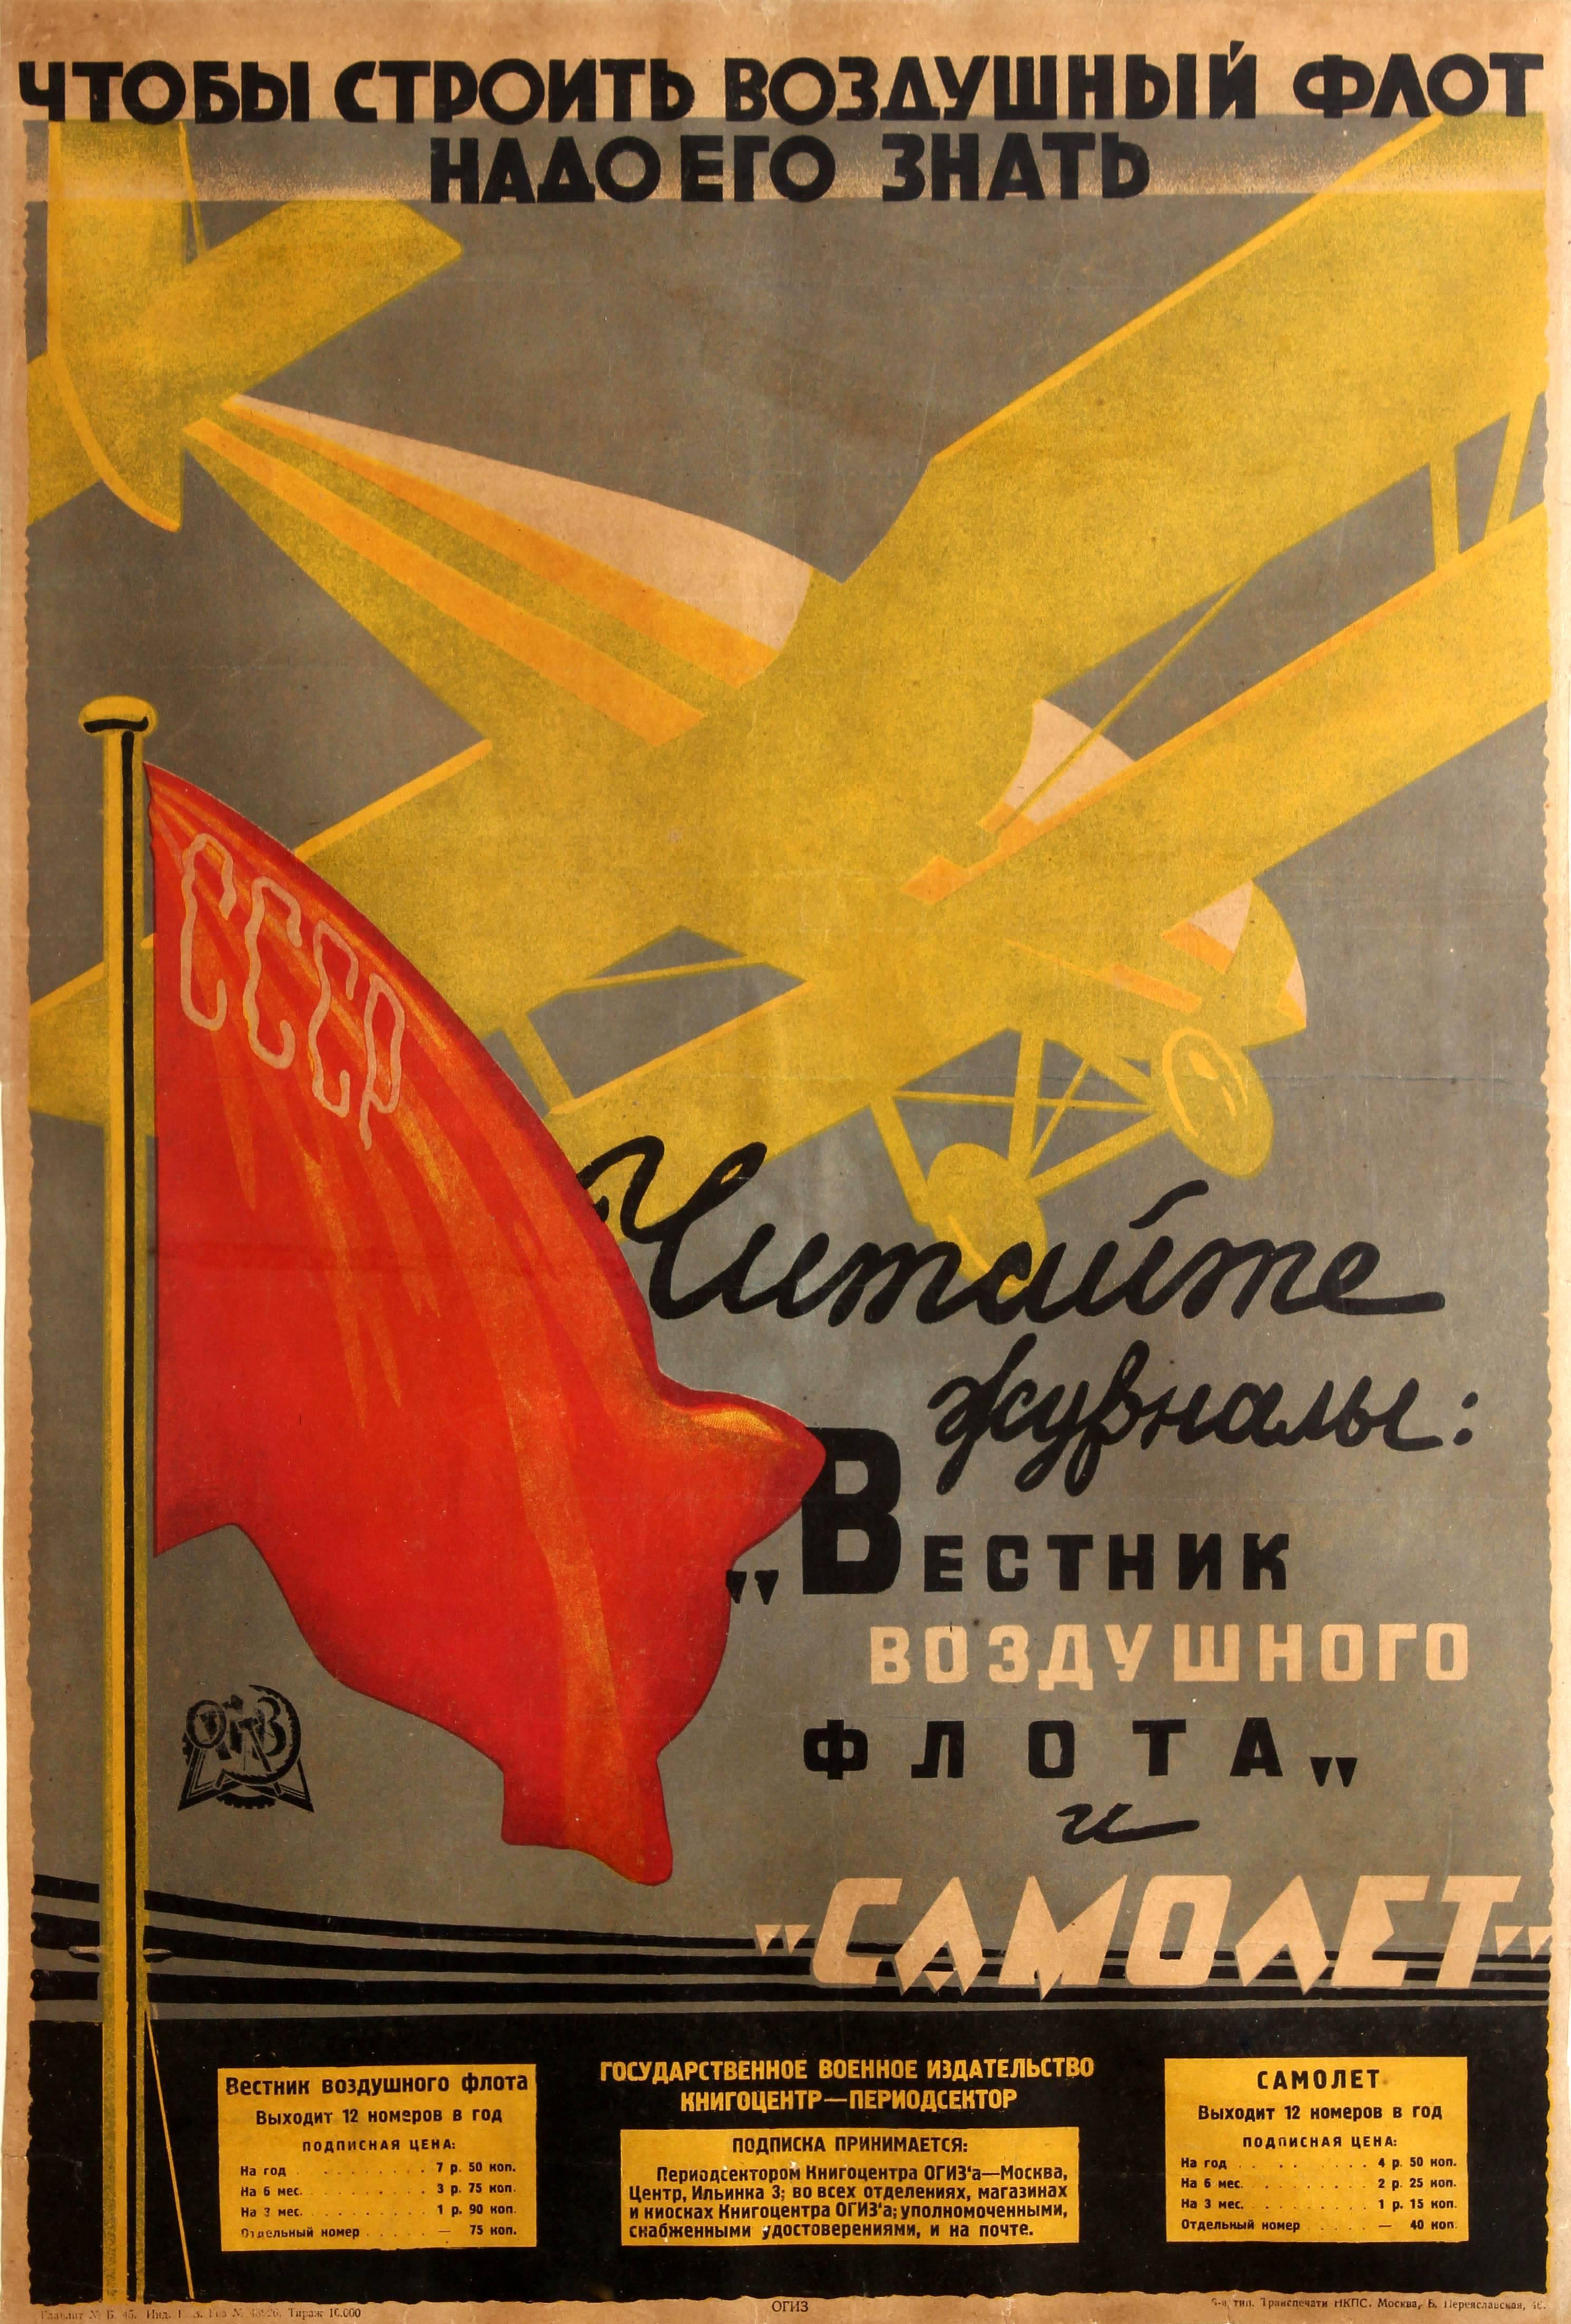 Original Vintage Soviet Poster Advertising USSR Air Fleet News Magazine Journal